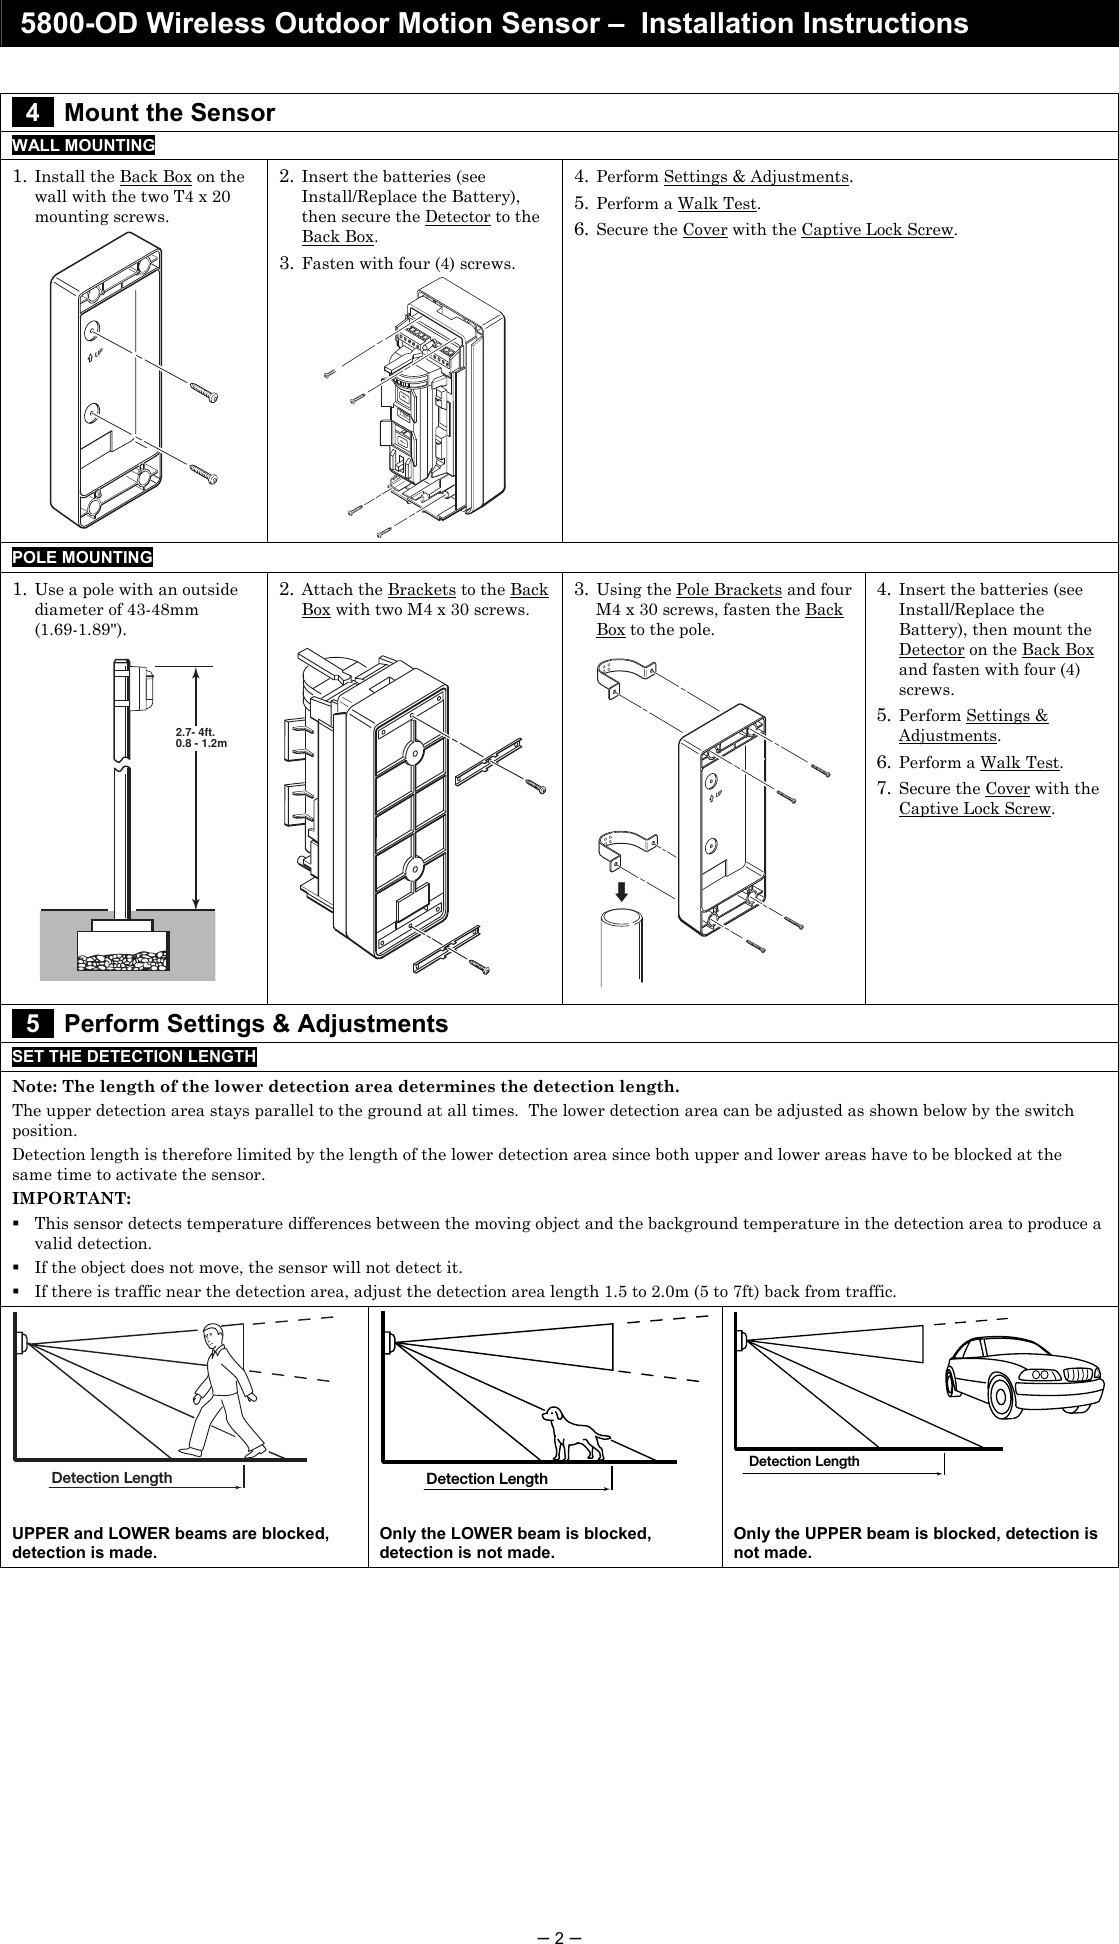 Car Alarm Installation Wiring Diagram Wiring Diagram Alarm System Car Inspirationa Simple Alarm System Of Car Alarm Installation Wiring Diagram